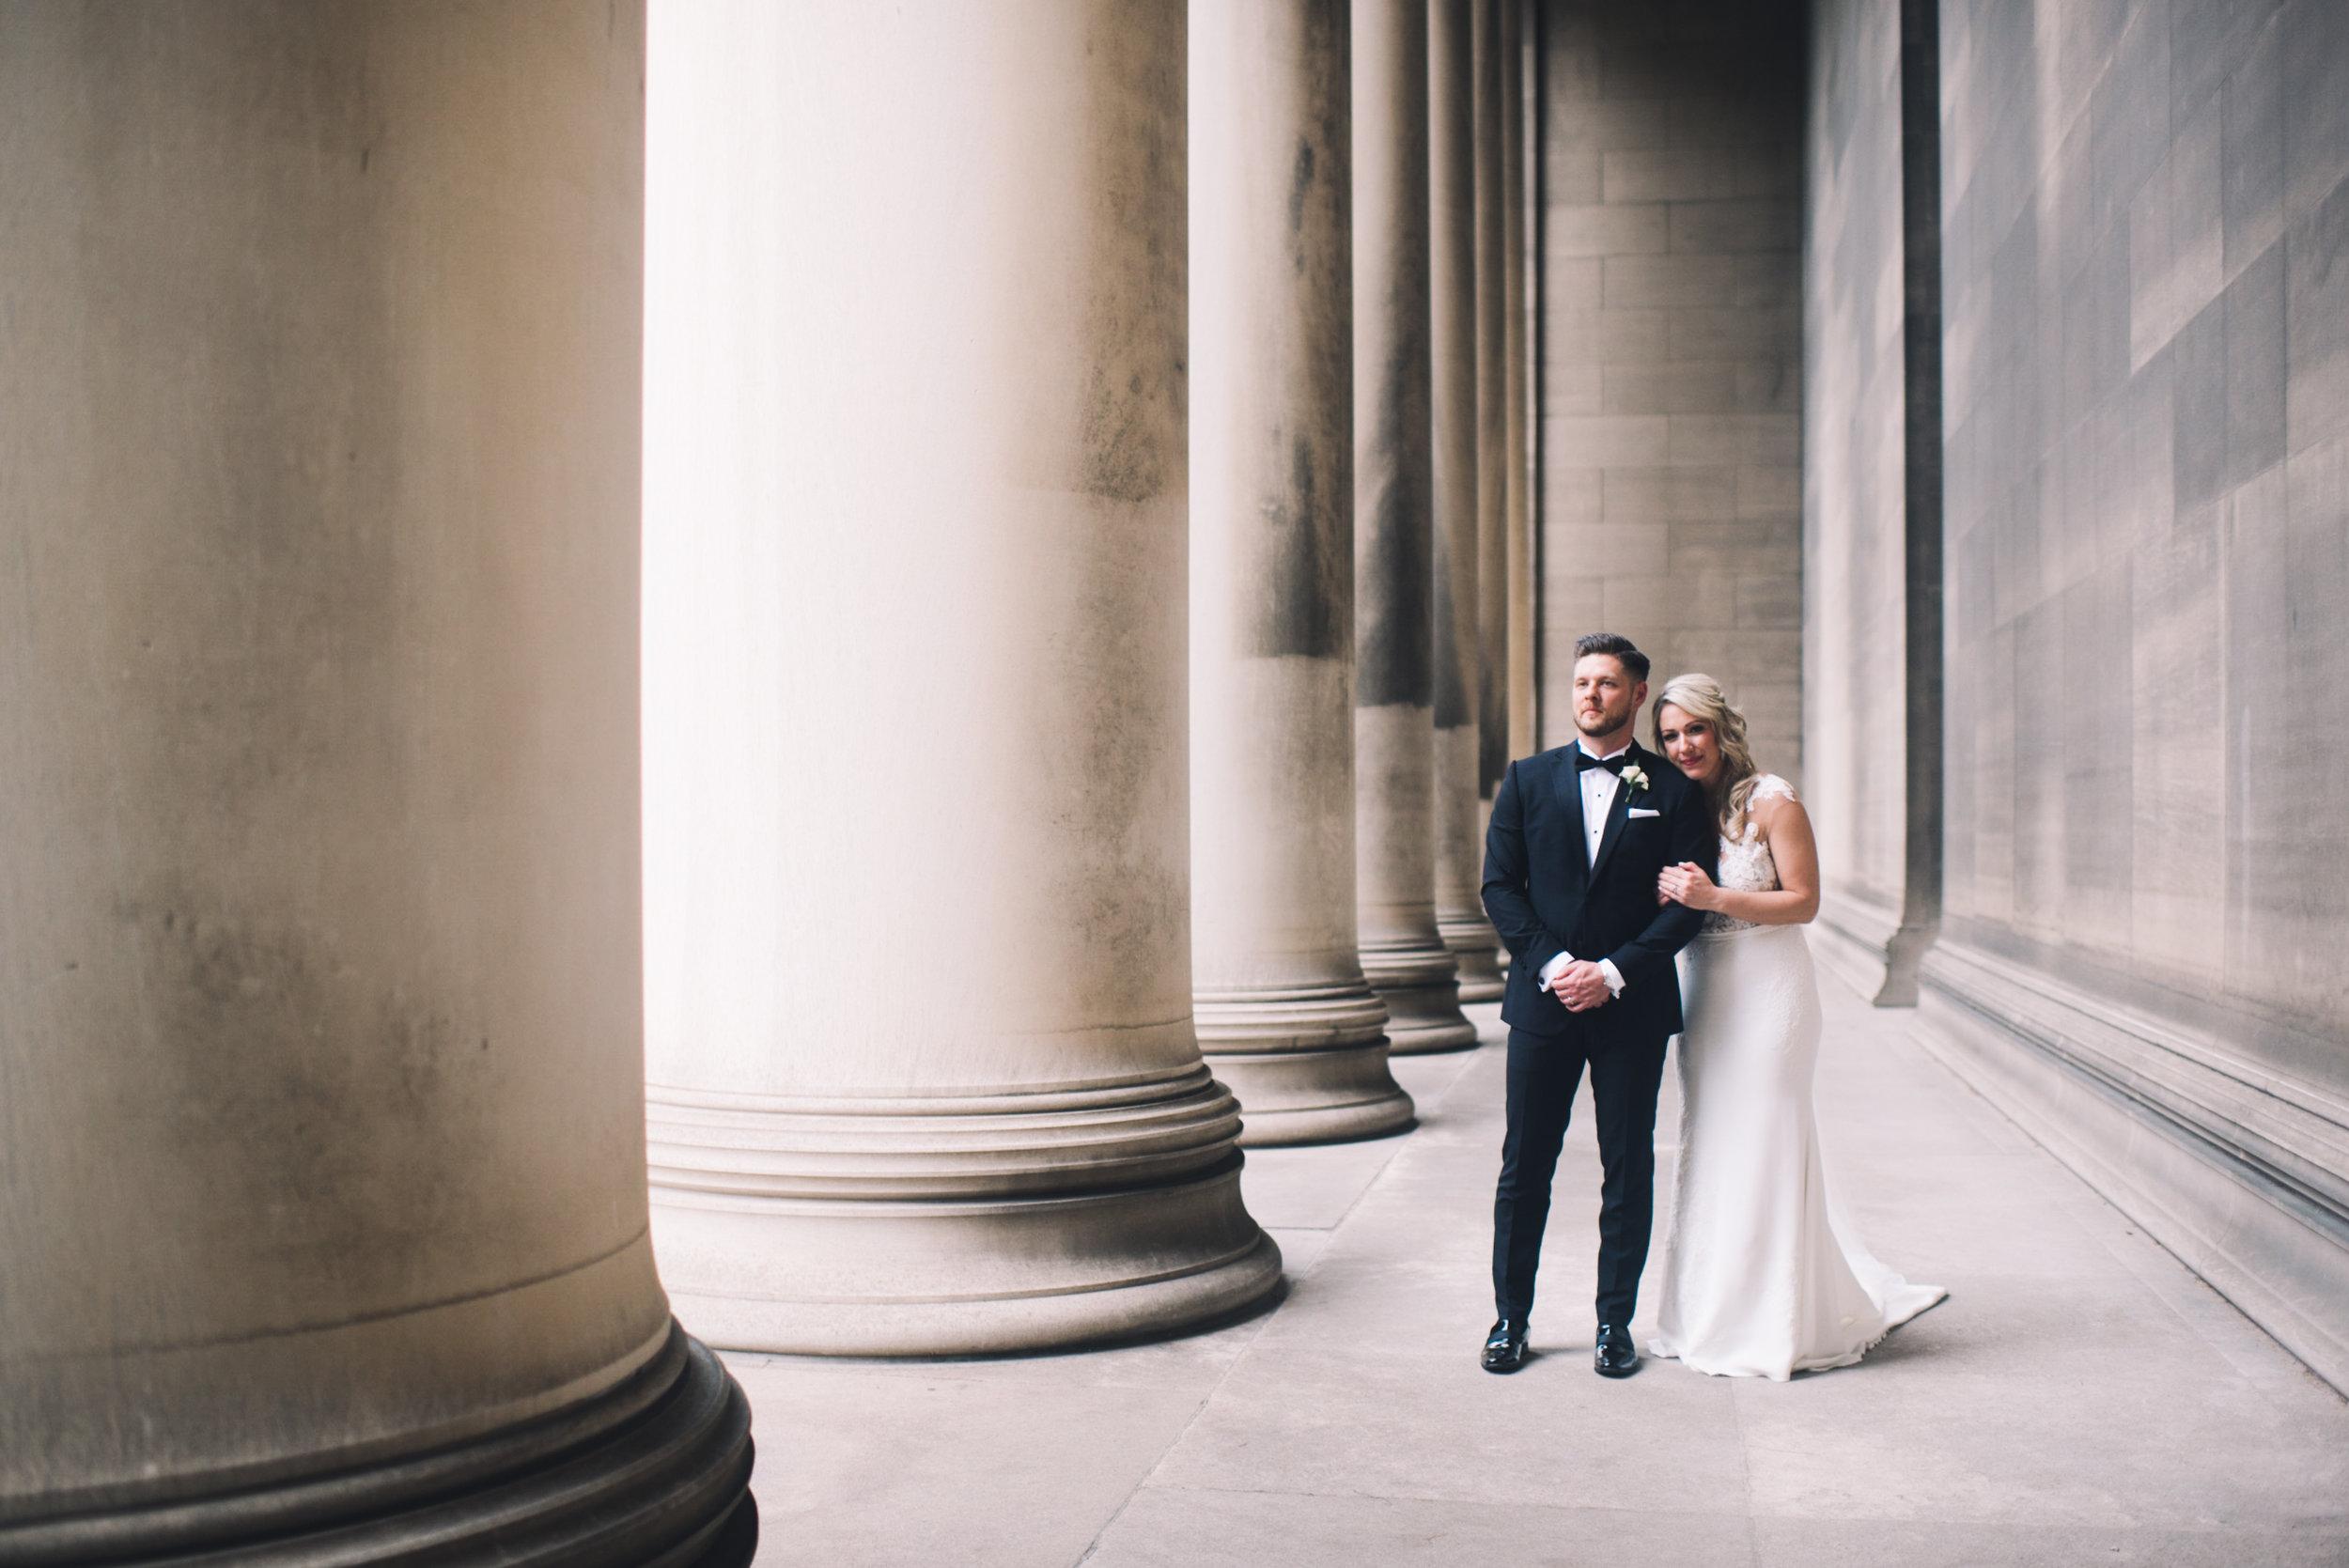 Pittsburgh Pennsylvania New York NYC Wedding Photographer Photojournalist Luxury Downtown Opera - Stirpe 904.jpg